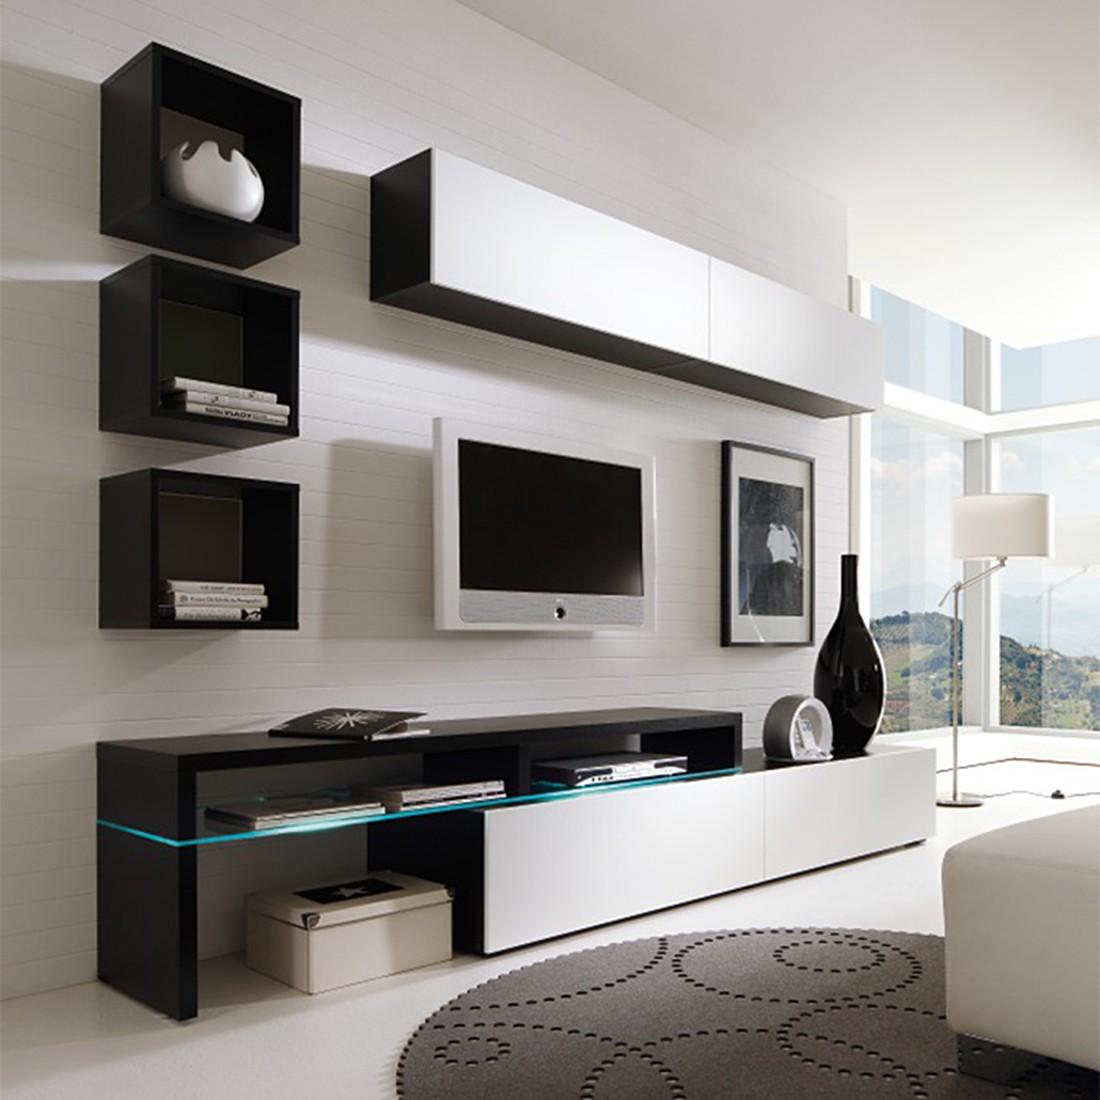 eek a wohnwand colourart 6 teilig schwarz wei mit beleuchtung fernbedienung cs. Black Bedroom Furniture Sets. Home Design Ideas